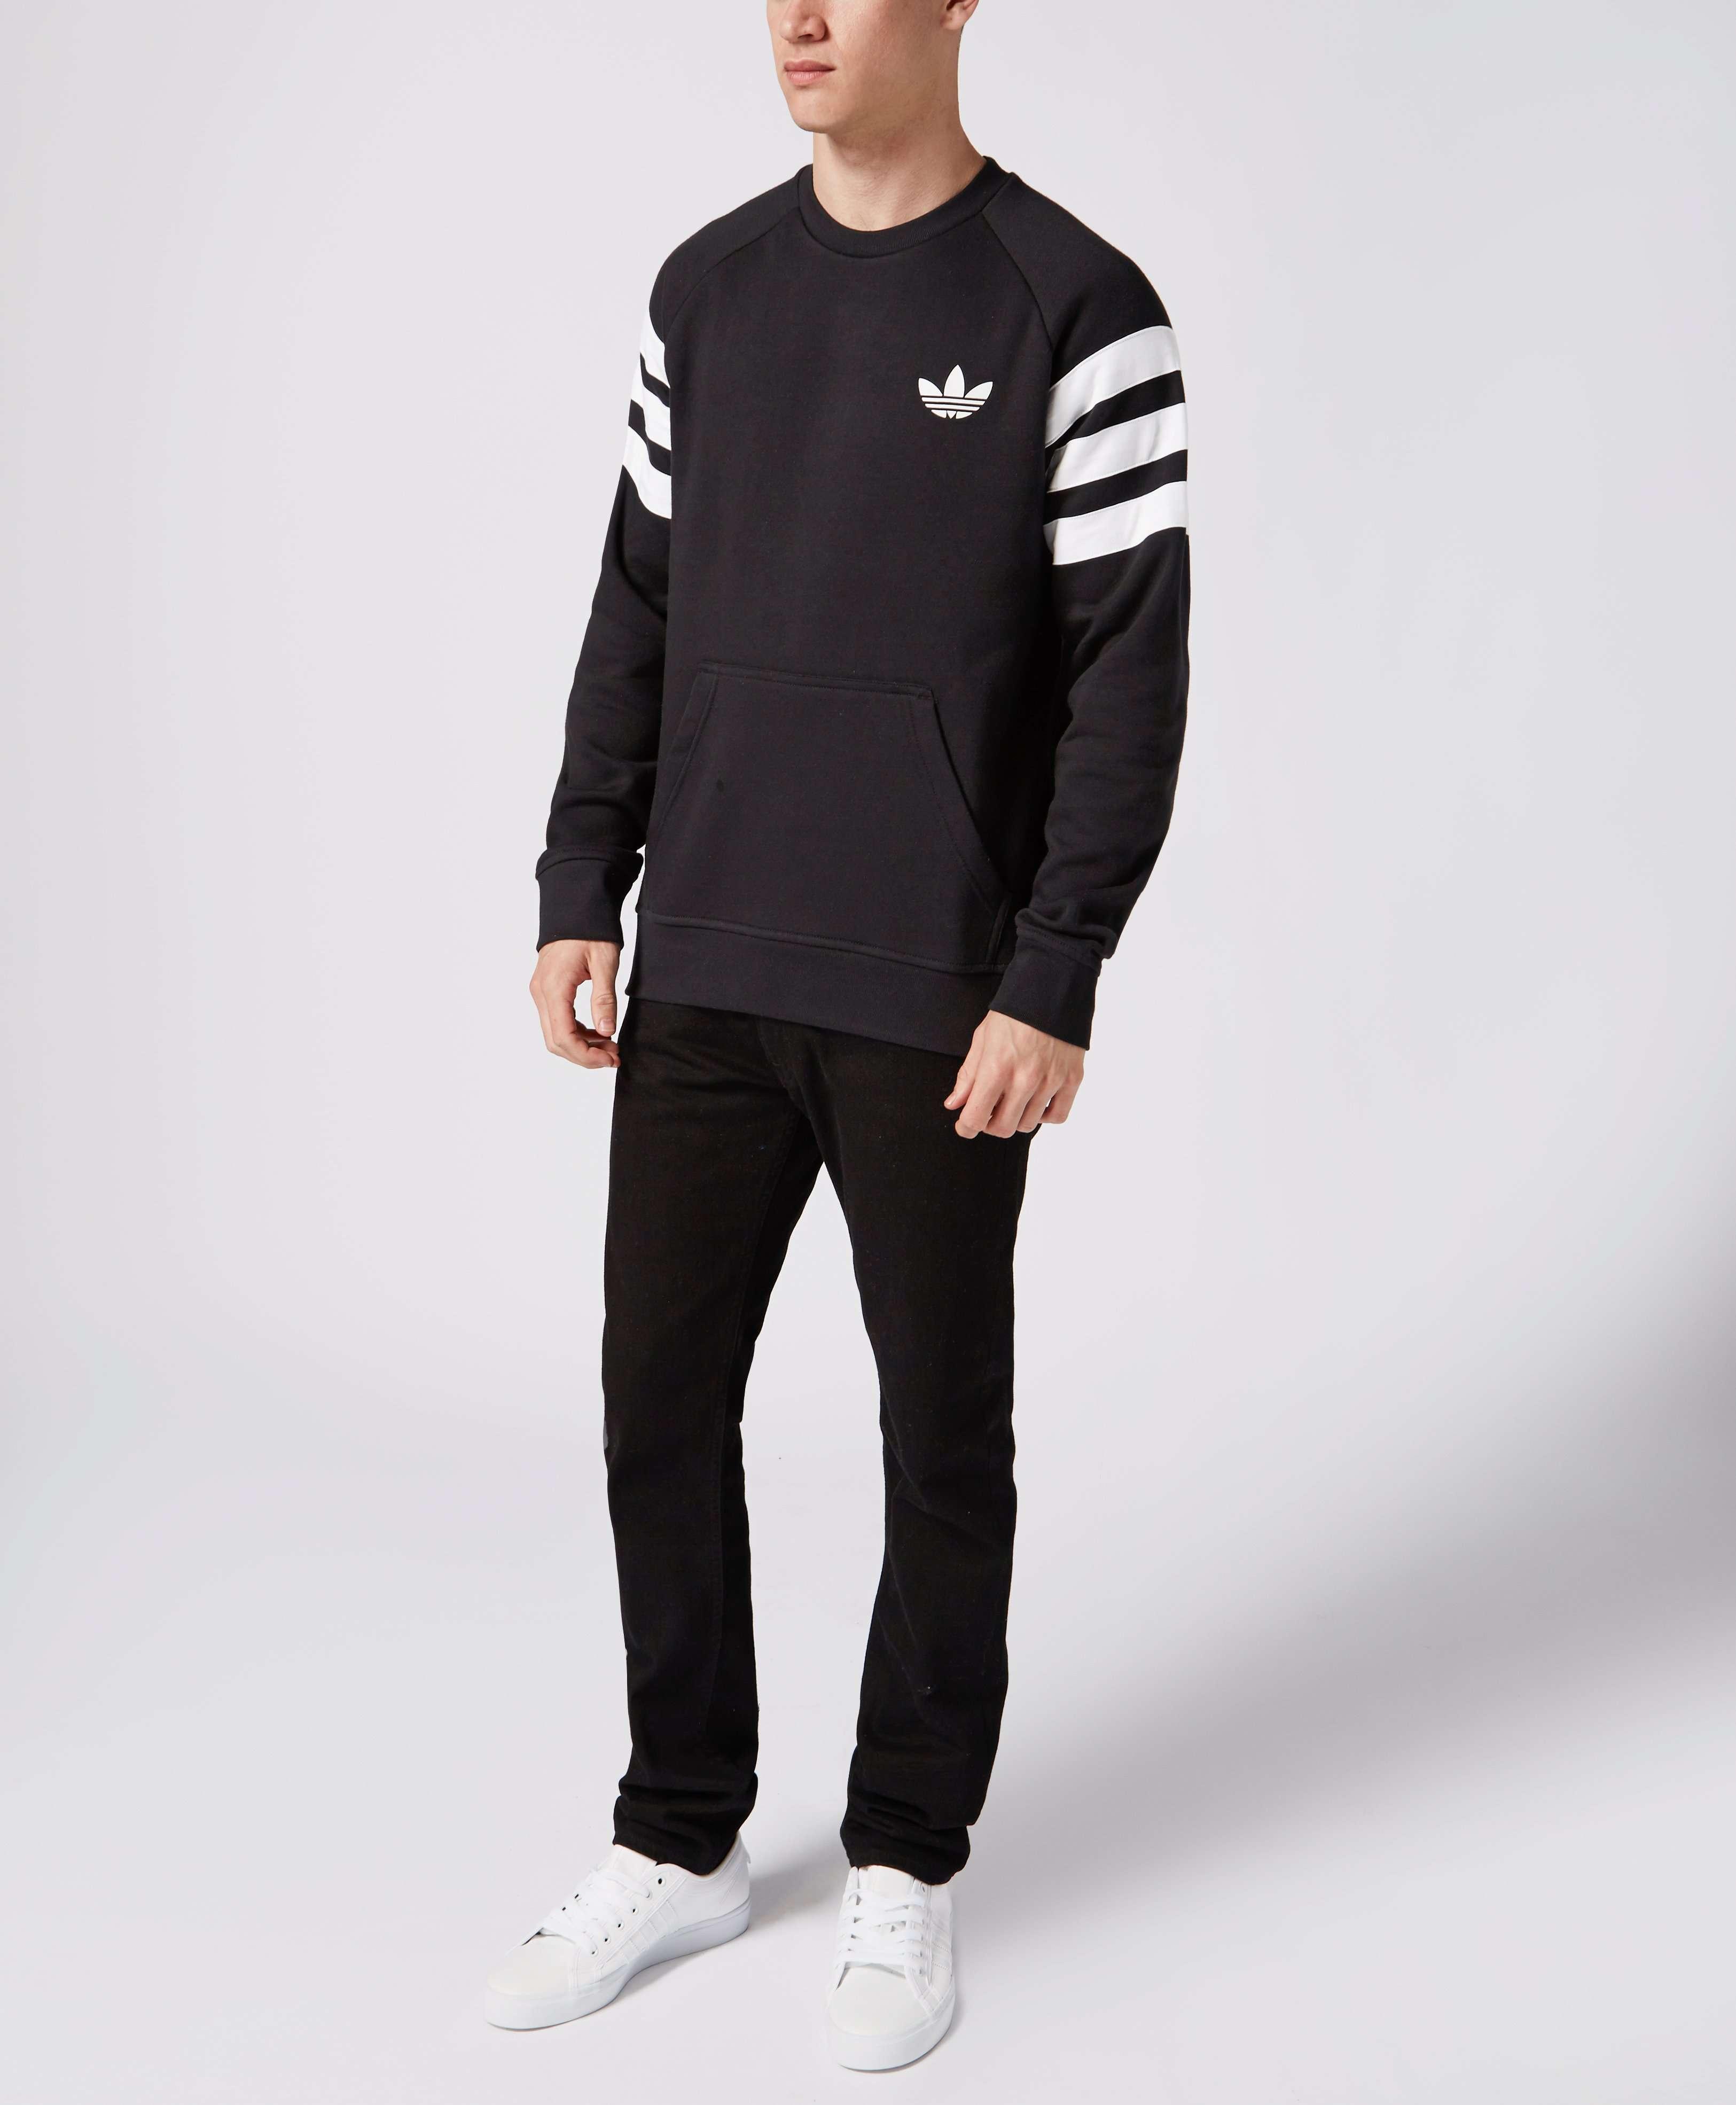 Adidas originali trifoglio tre strisce tasca felpa scotts